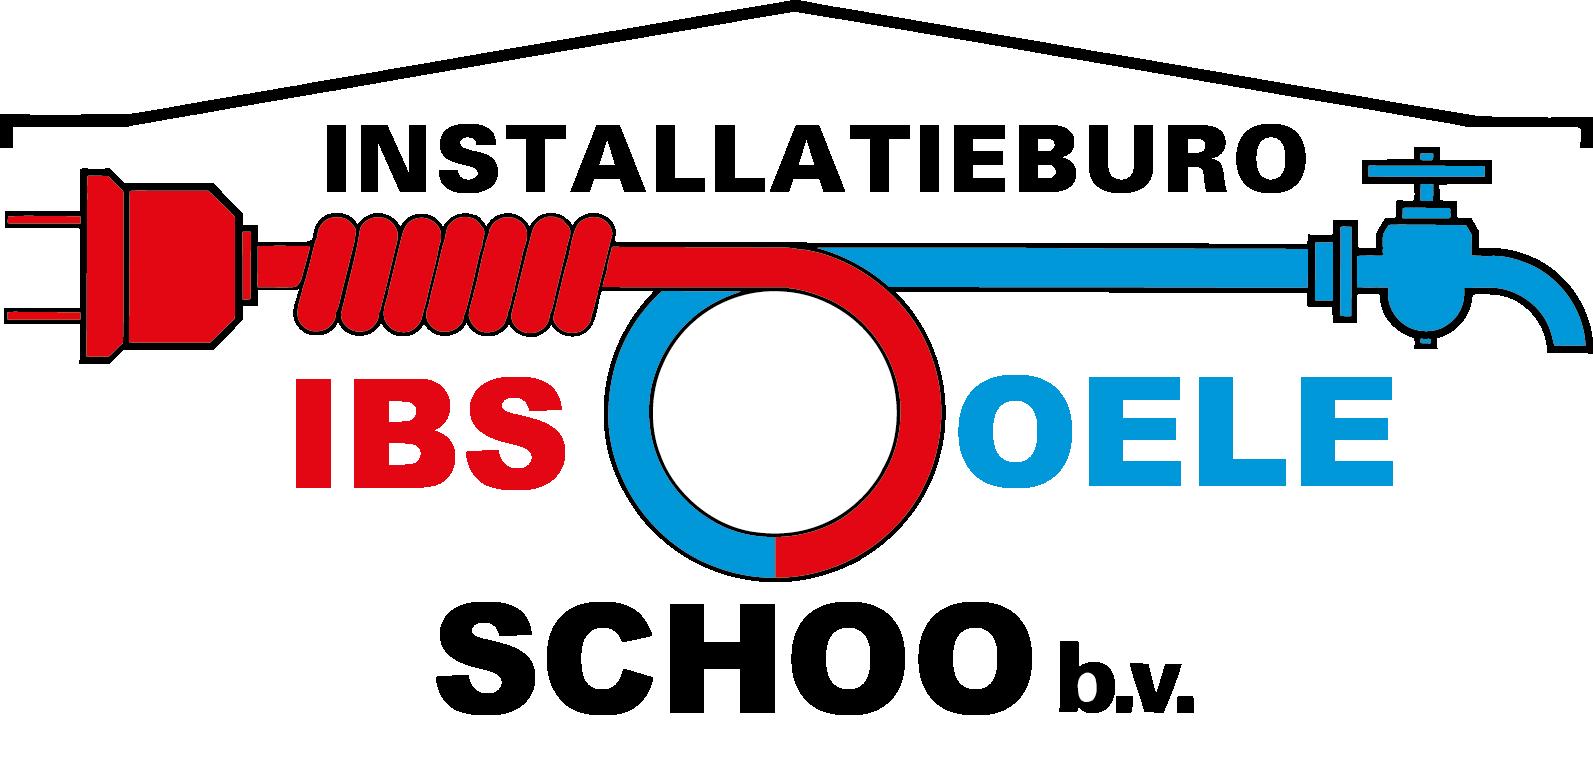 Installatieburo IBS-OELE-SCHOO b.v.